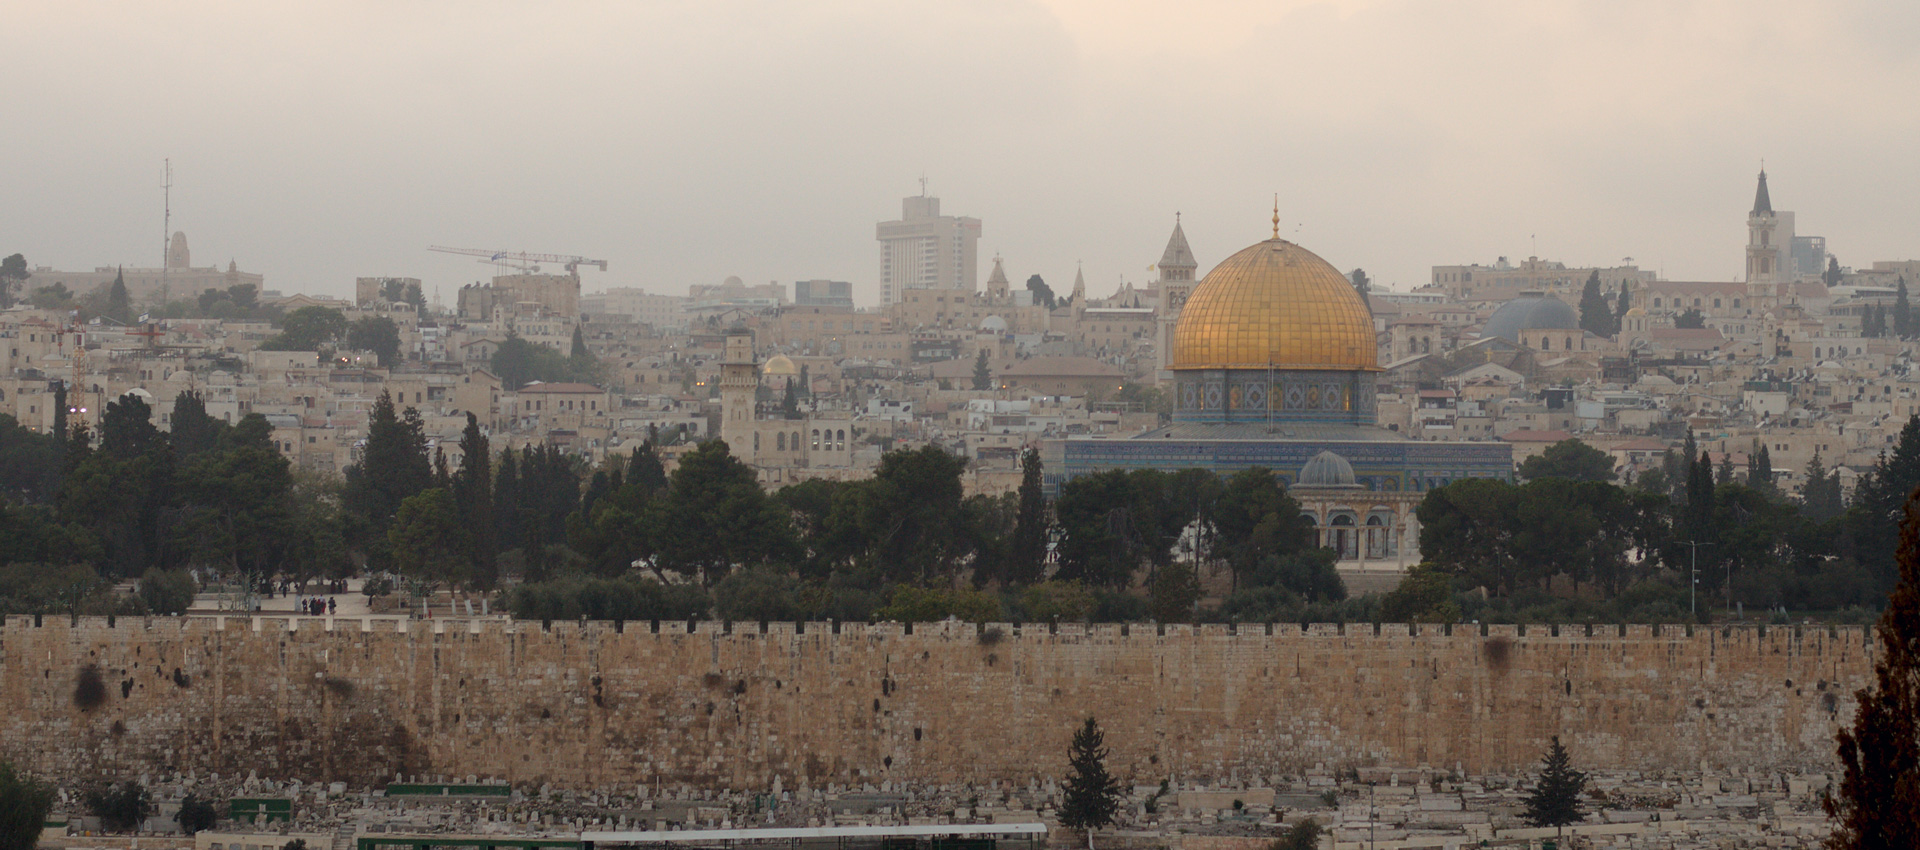 Israel Traveldiary #4 - Das einzigartige Jerusalem